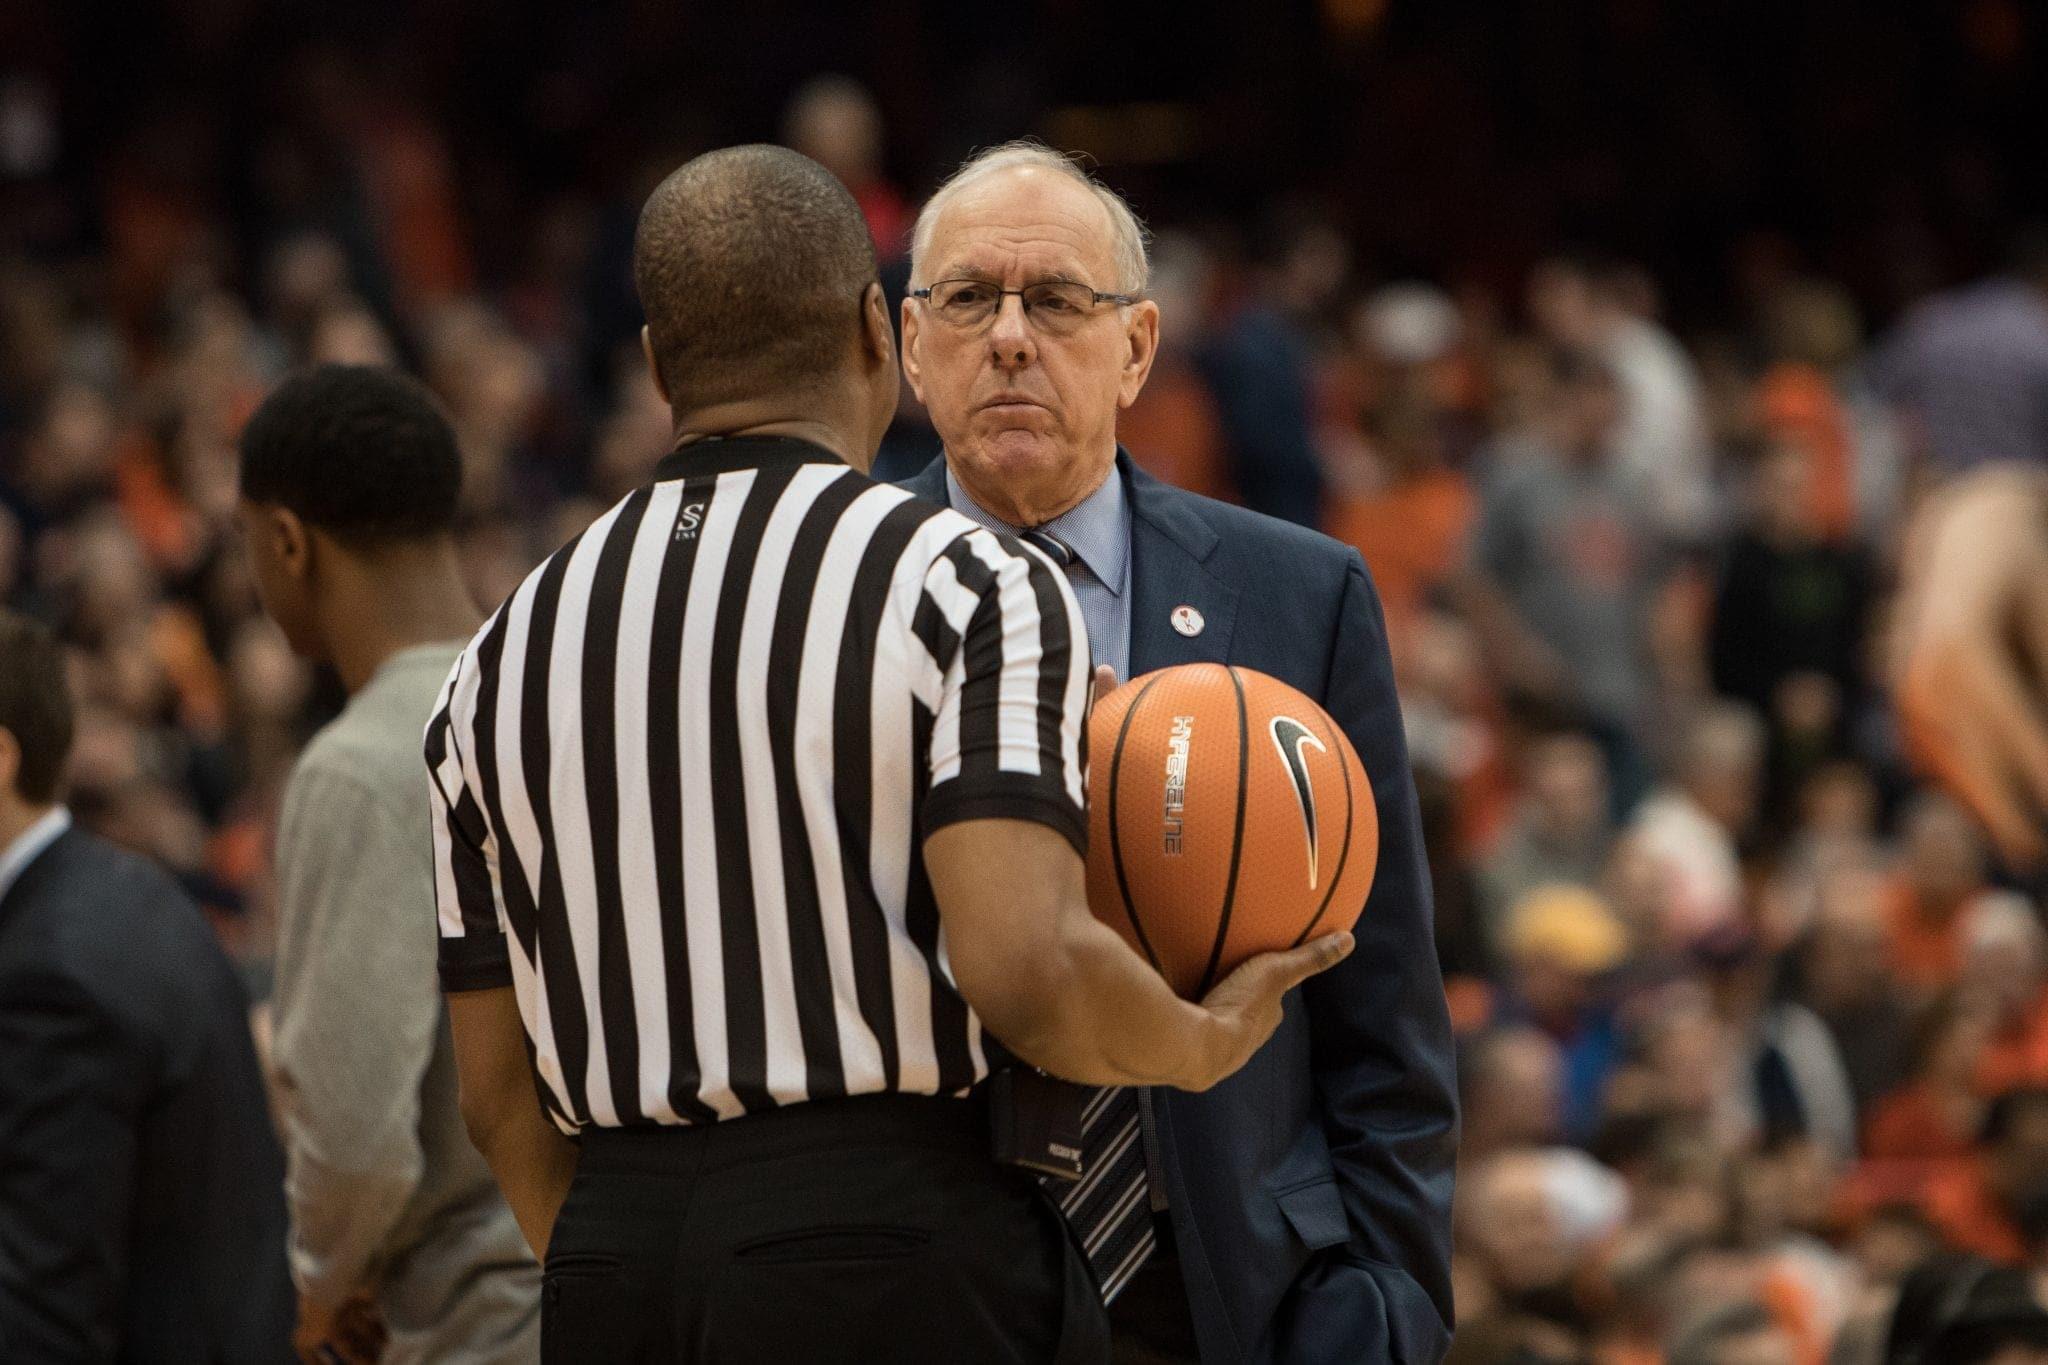 Coach Jim Boeheim and referee